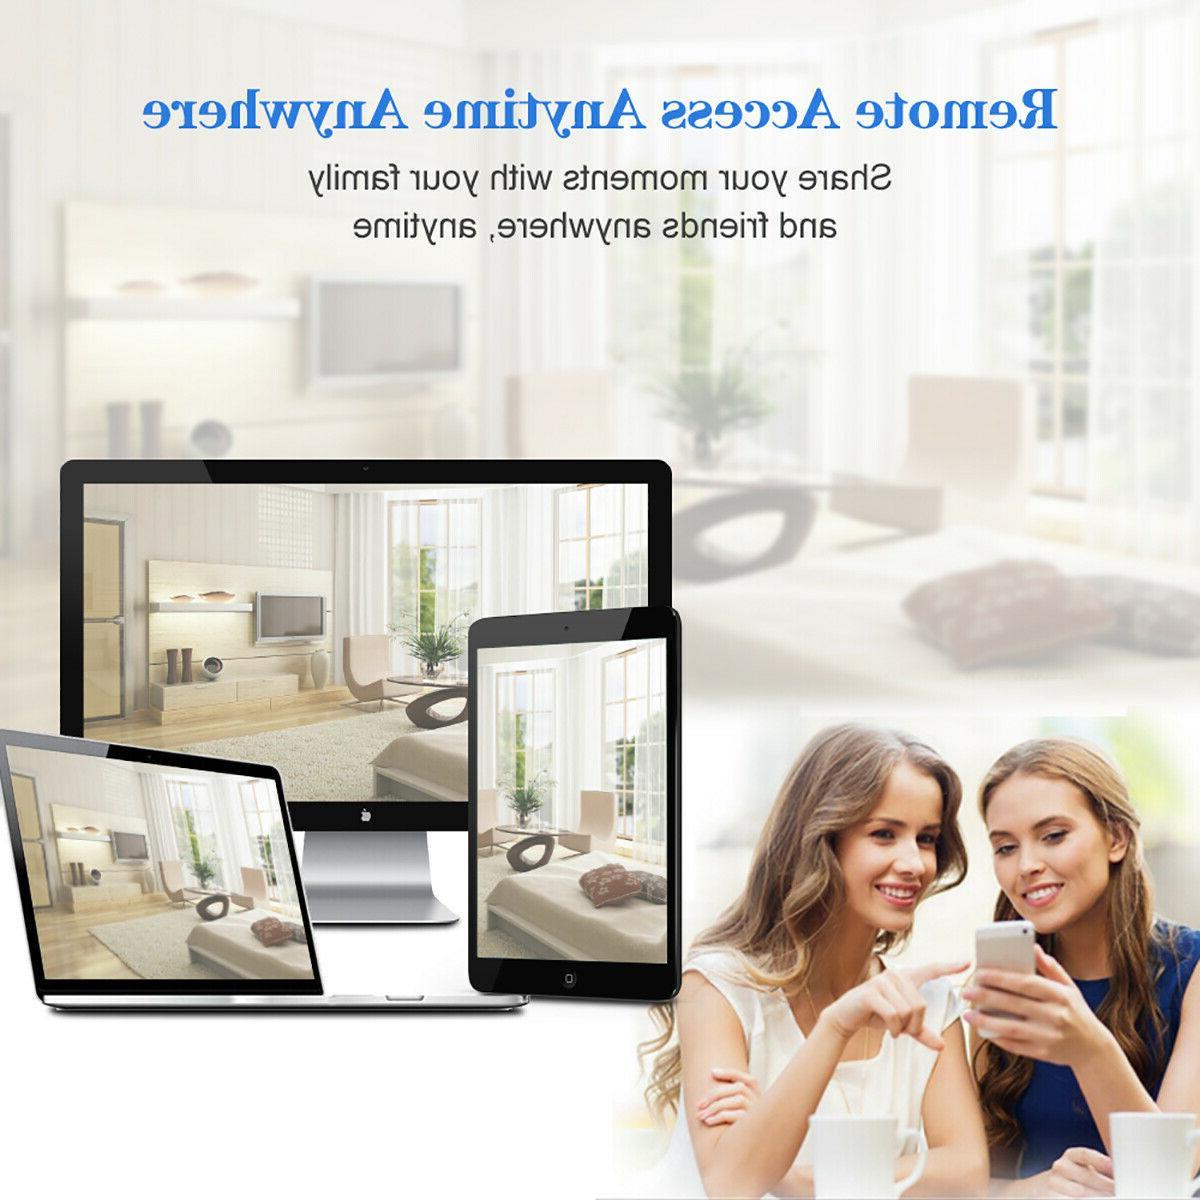 SmartSF 4CH 1080P DVR Outdoor Camera System HD CCTV